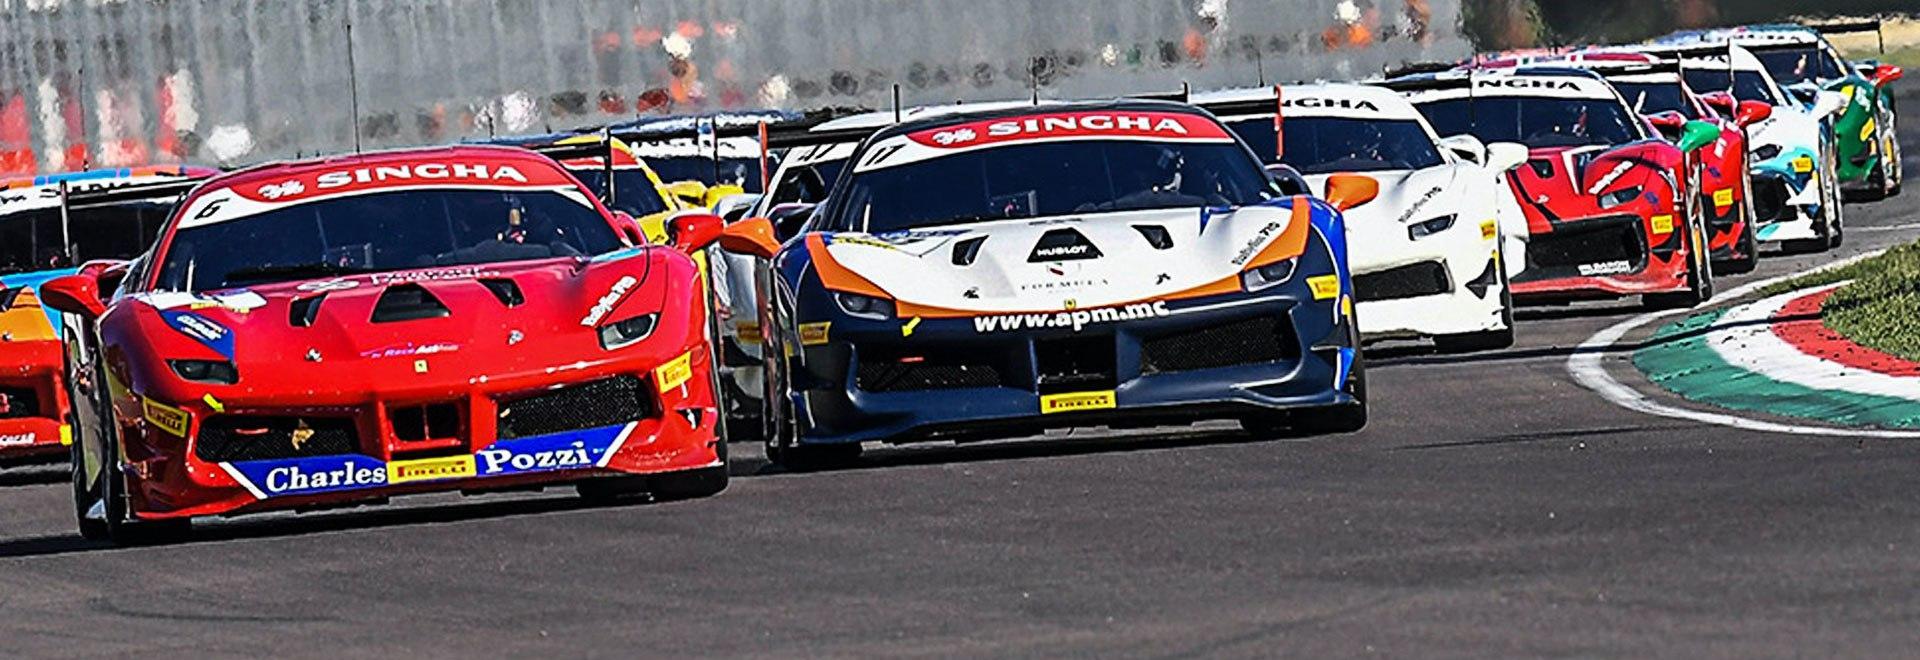 Trofeo Pirelli Portimao. Gara 2